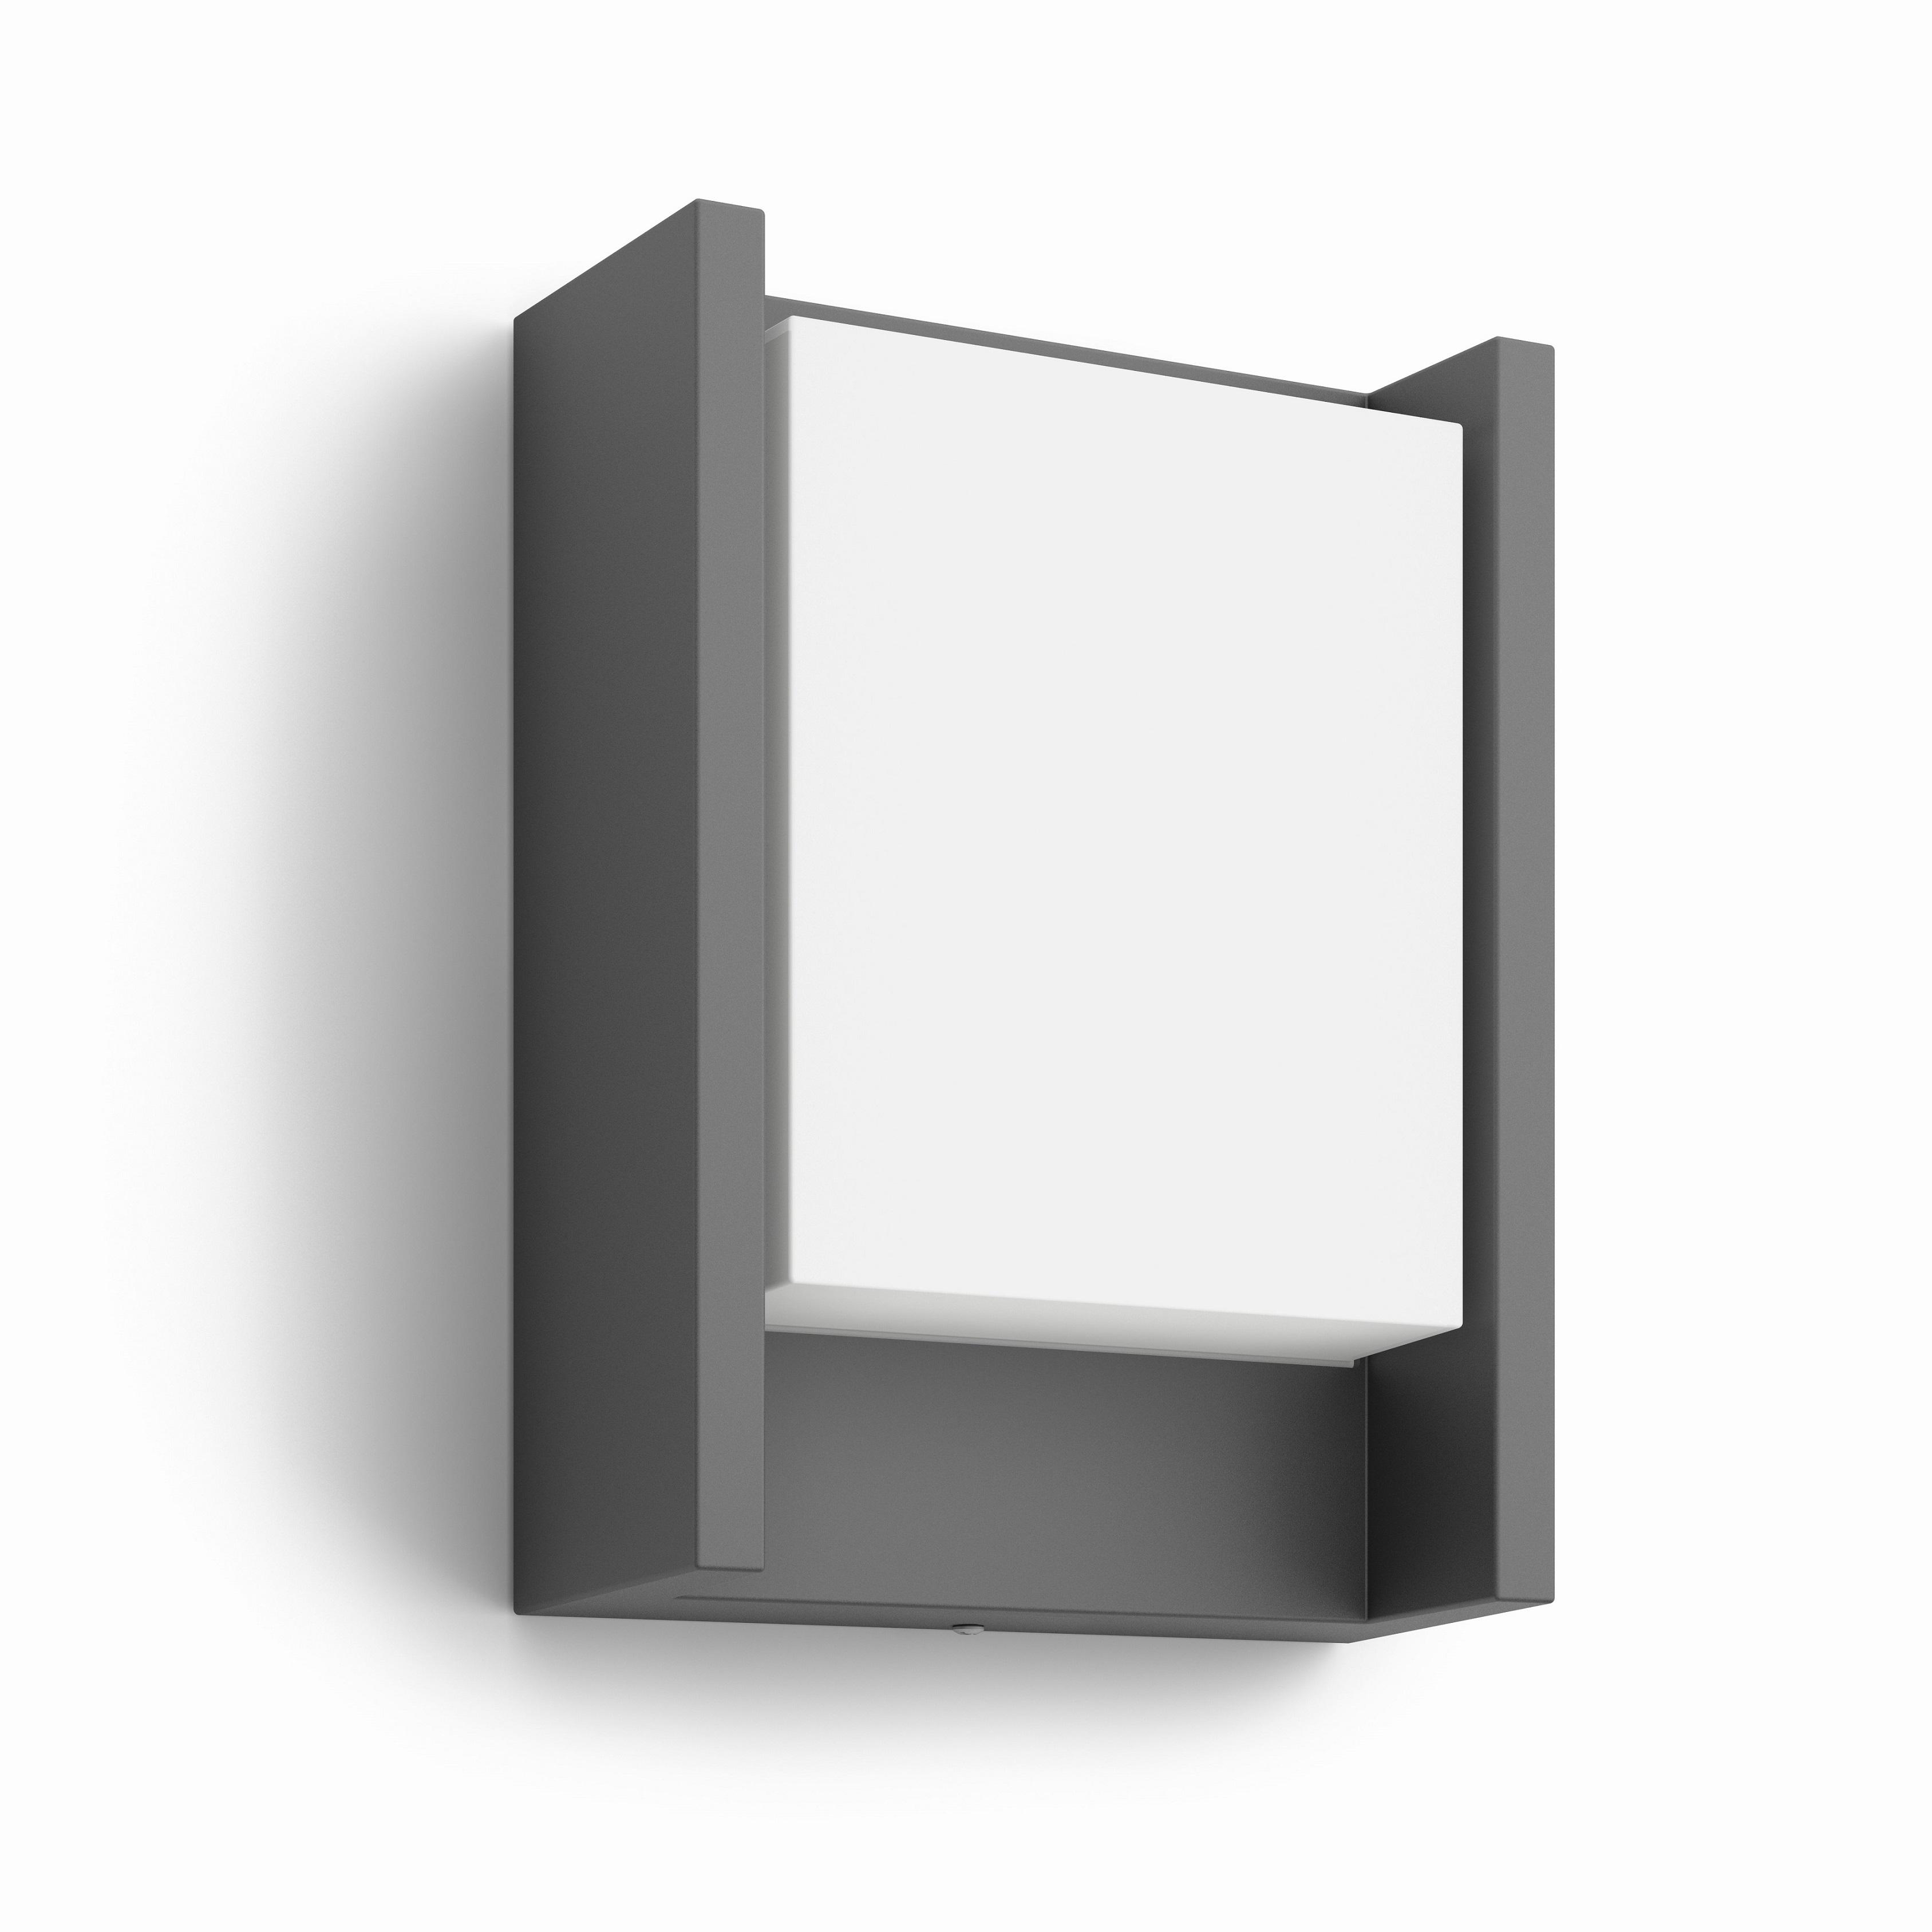 Philips myGarden LED-vägglampa Arbor 6 W antracit 164609316